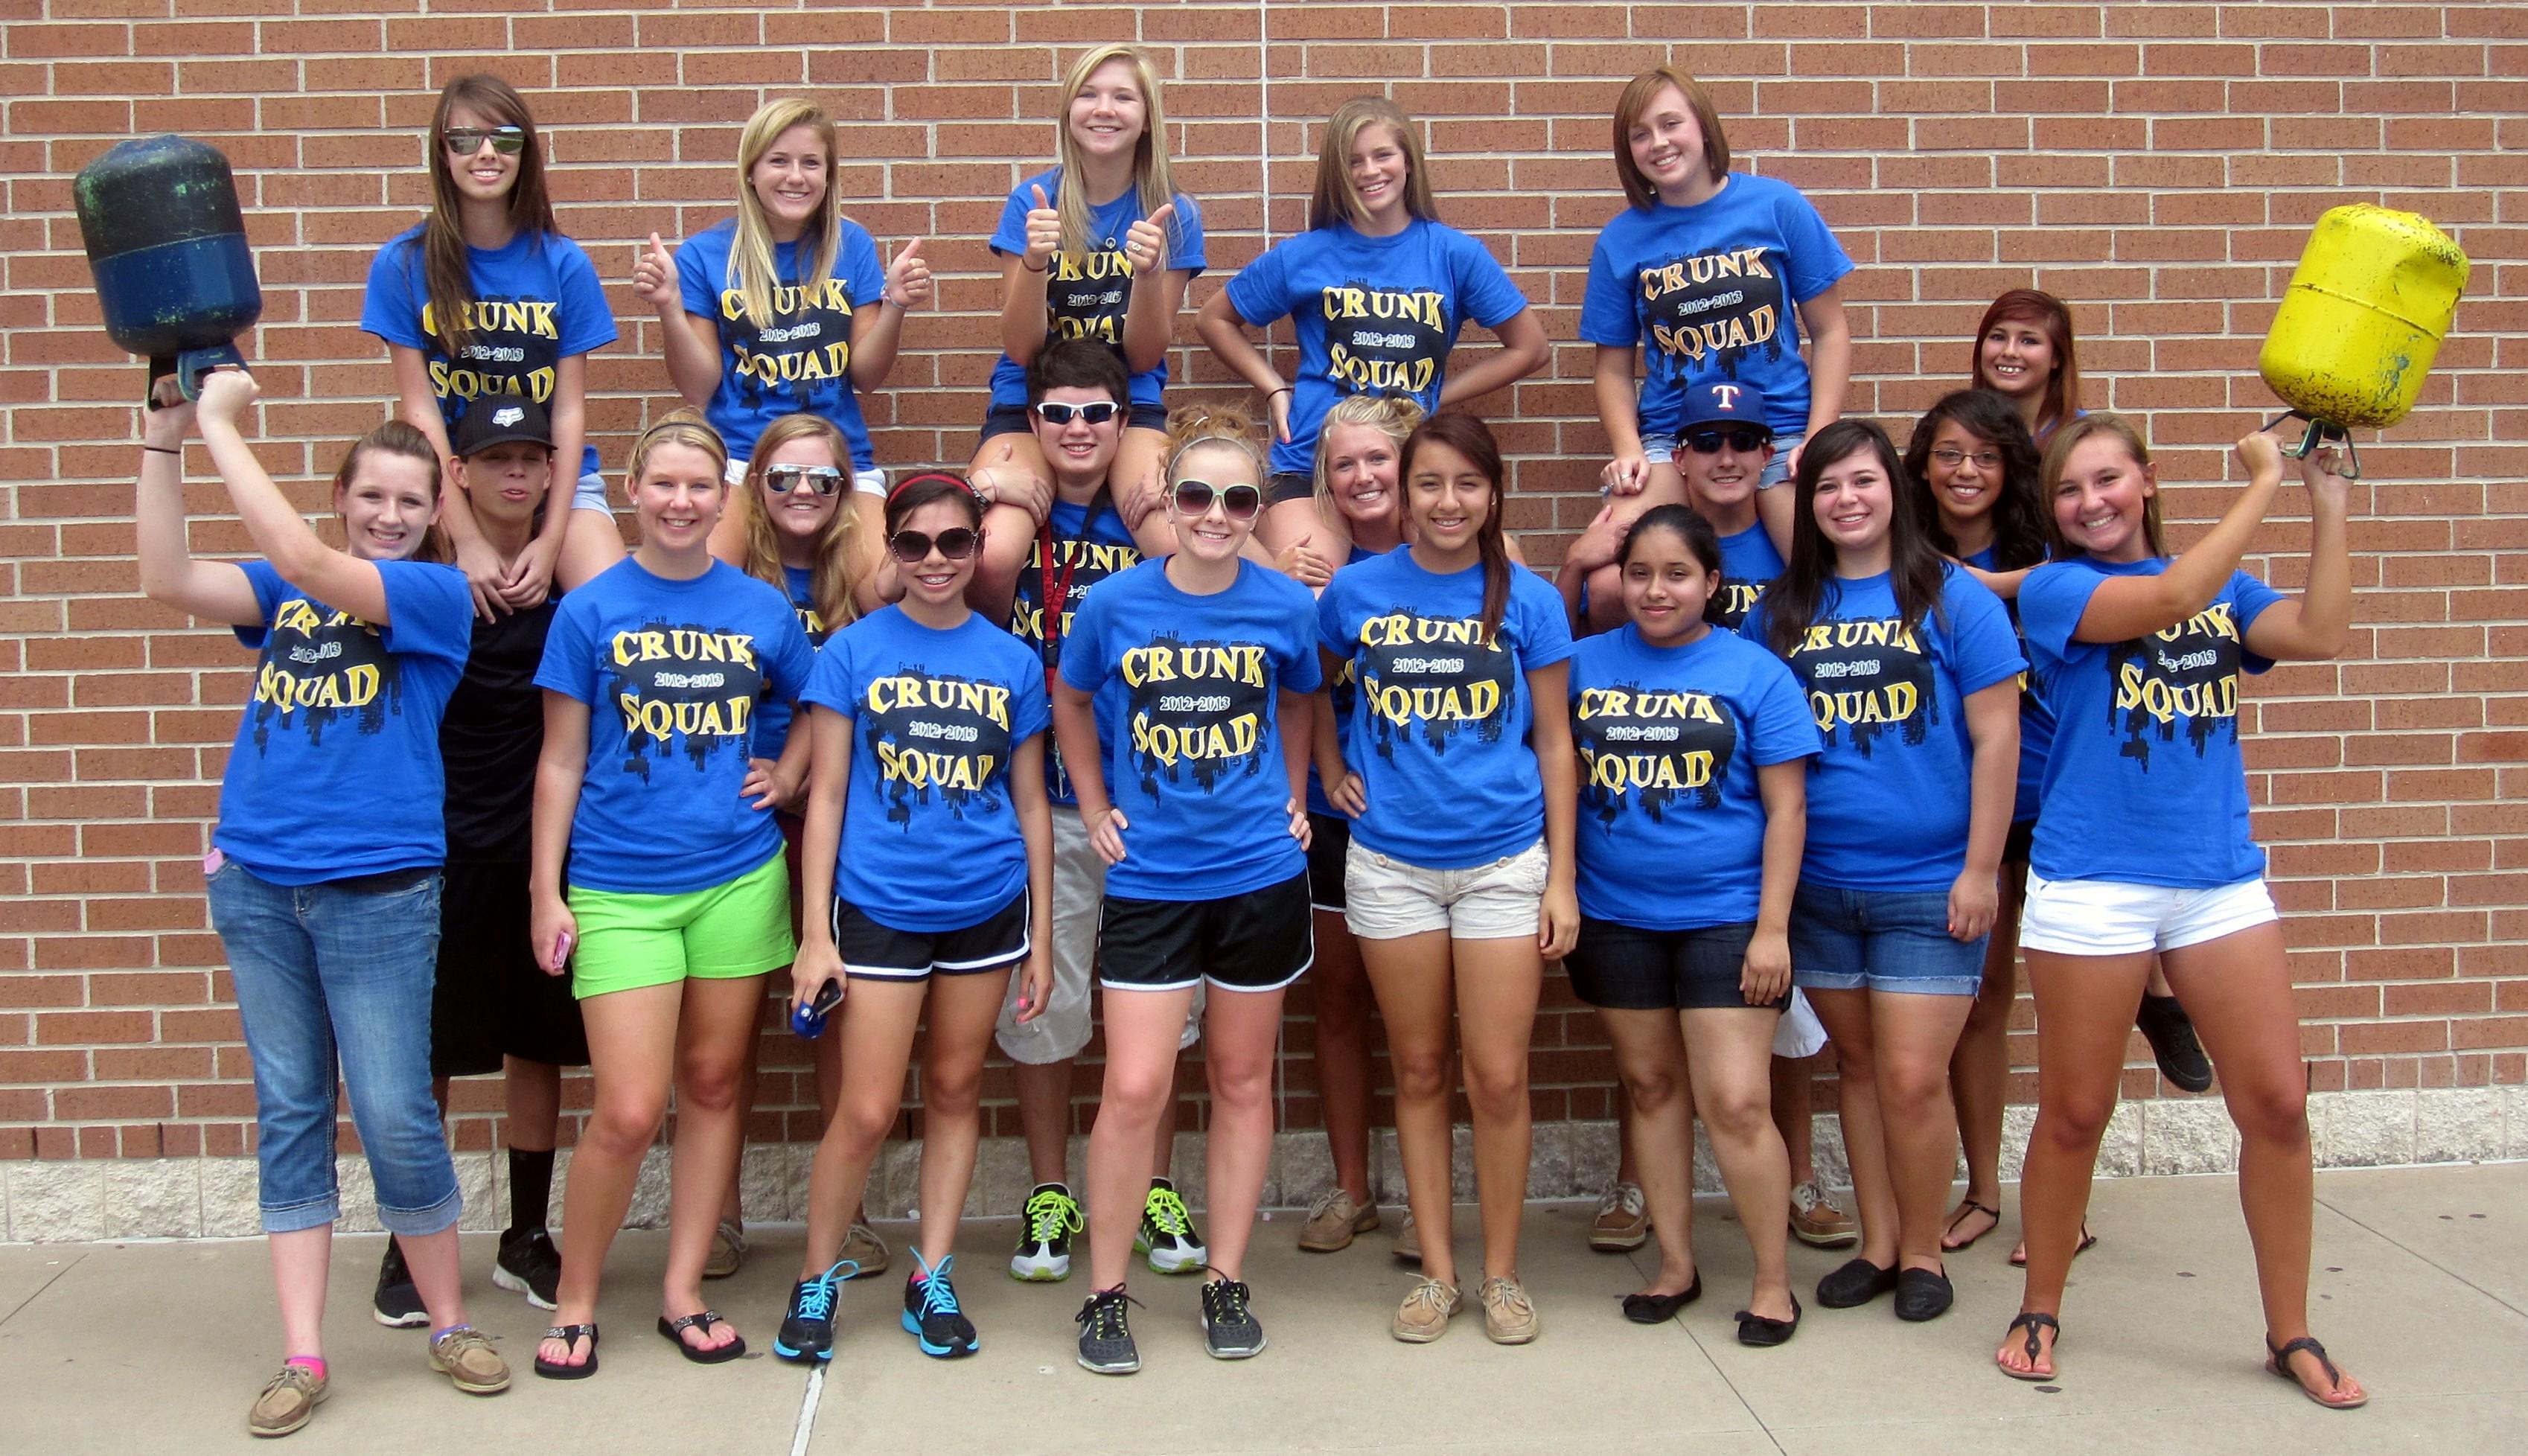 School shirt design your own - Bay City High School Crunk Squad T Shirt Photo